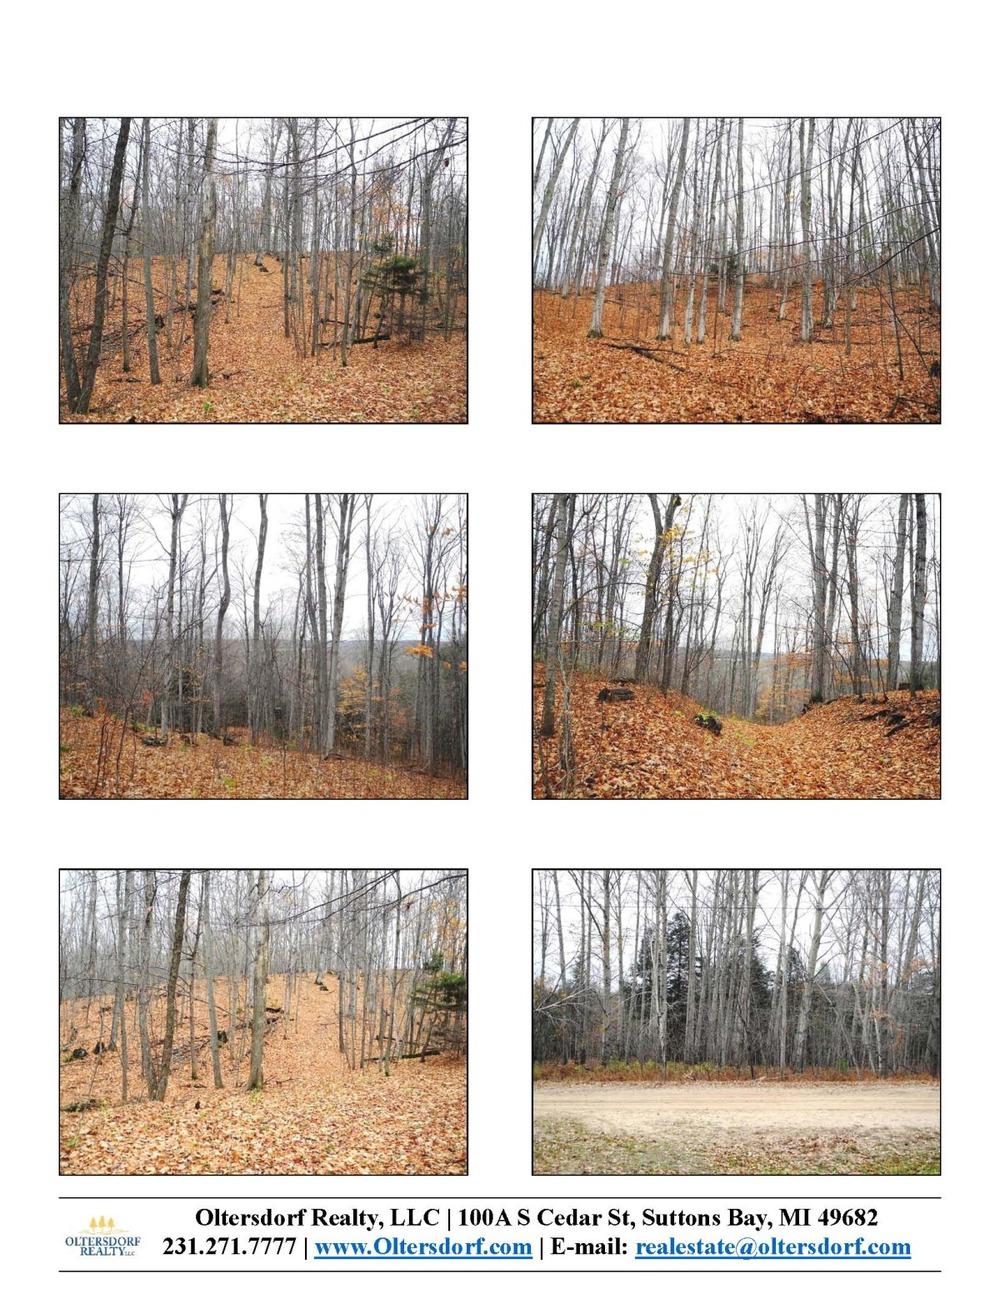 e nicholas drive, traverse city, leelanau county, acreage for sale by oltersdorf realty llc (5).jpg